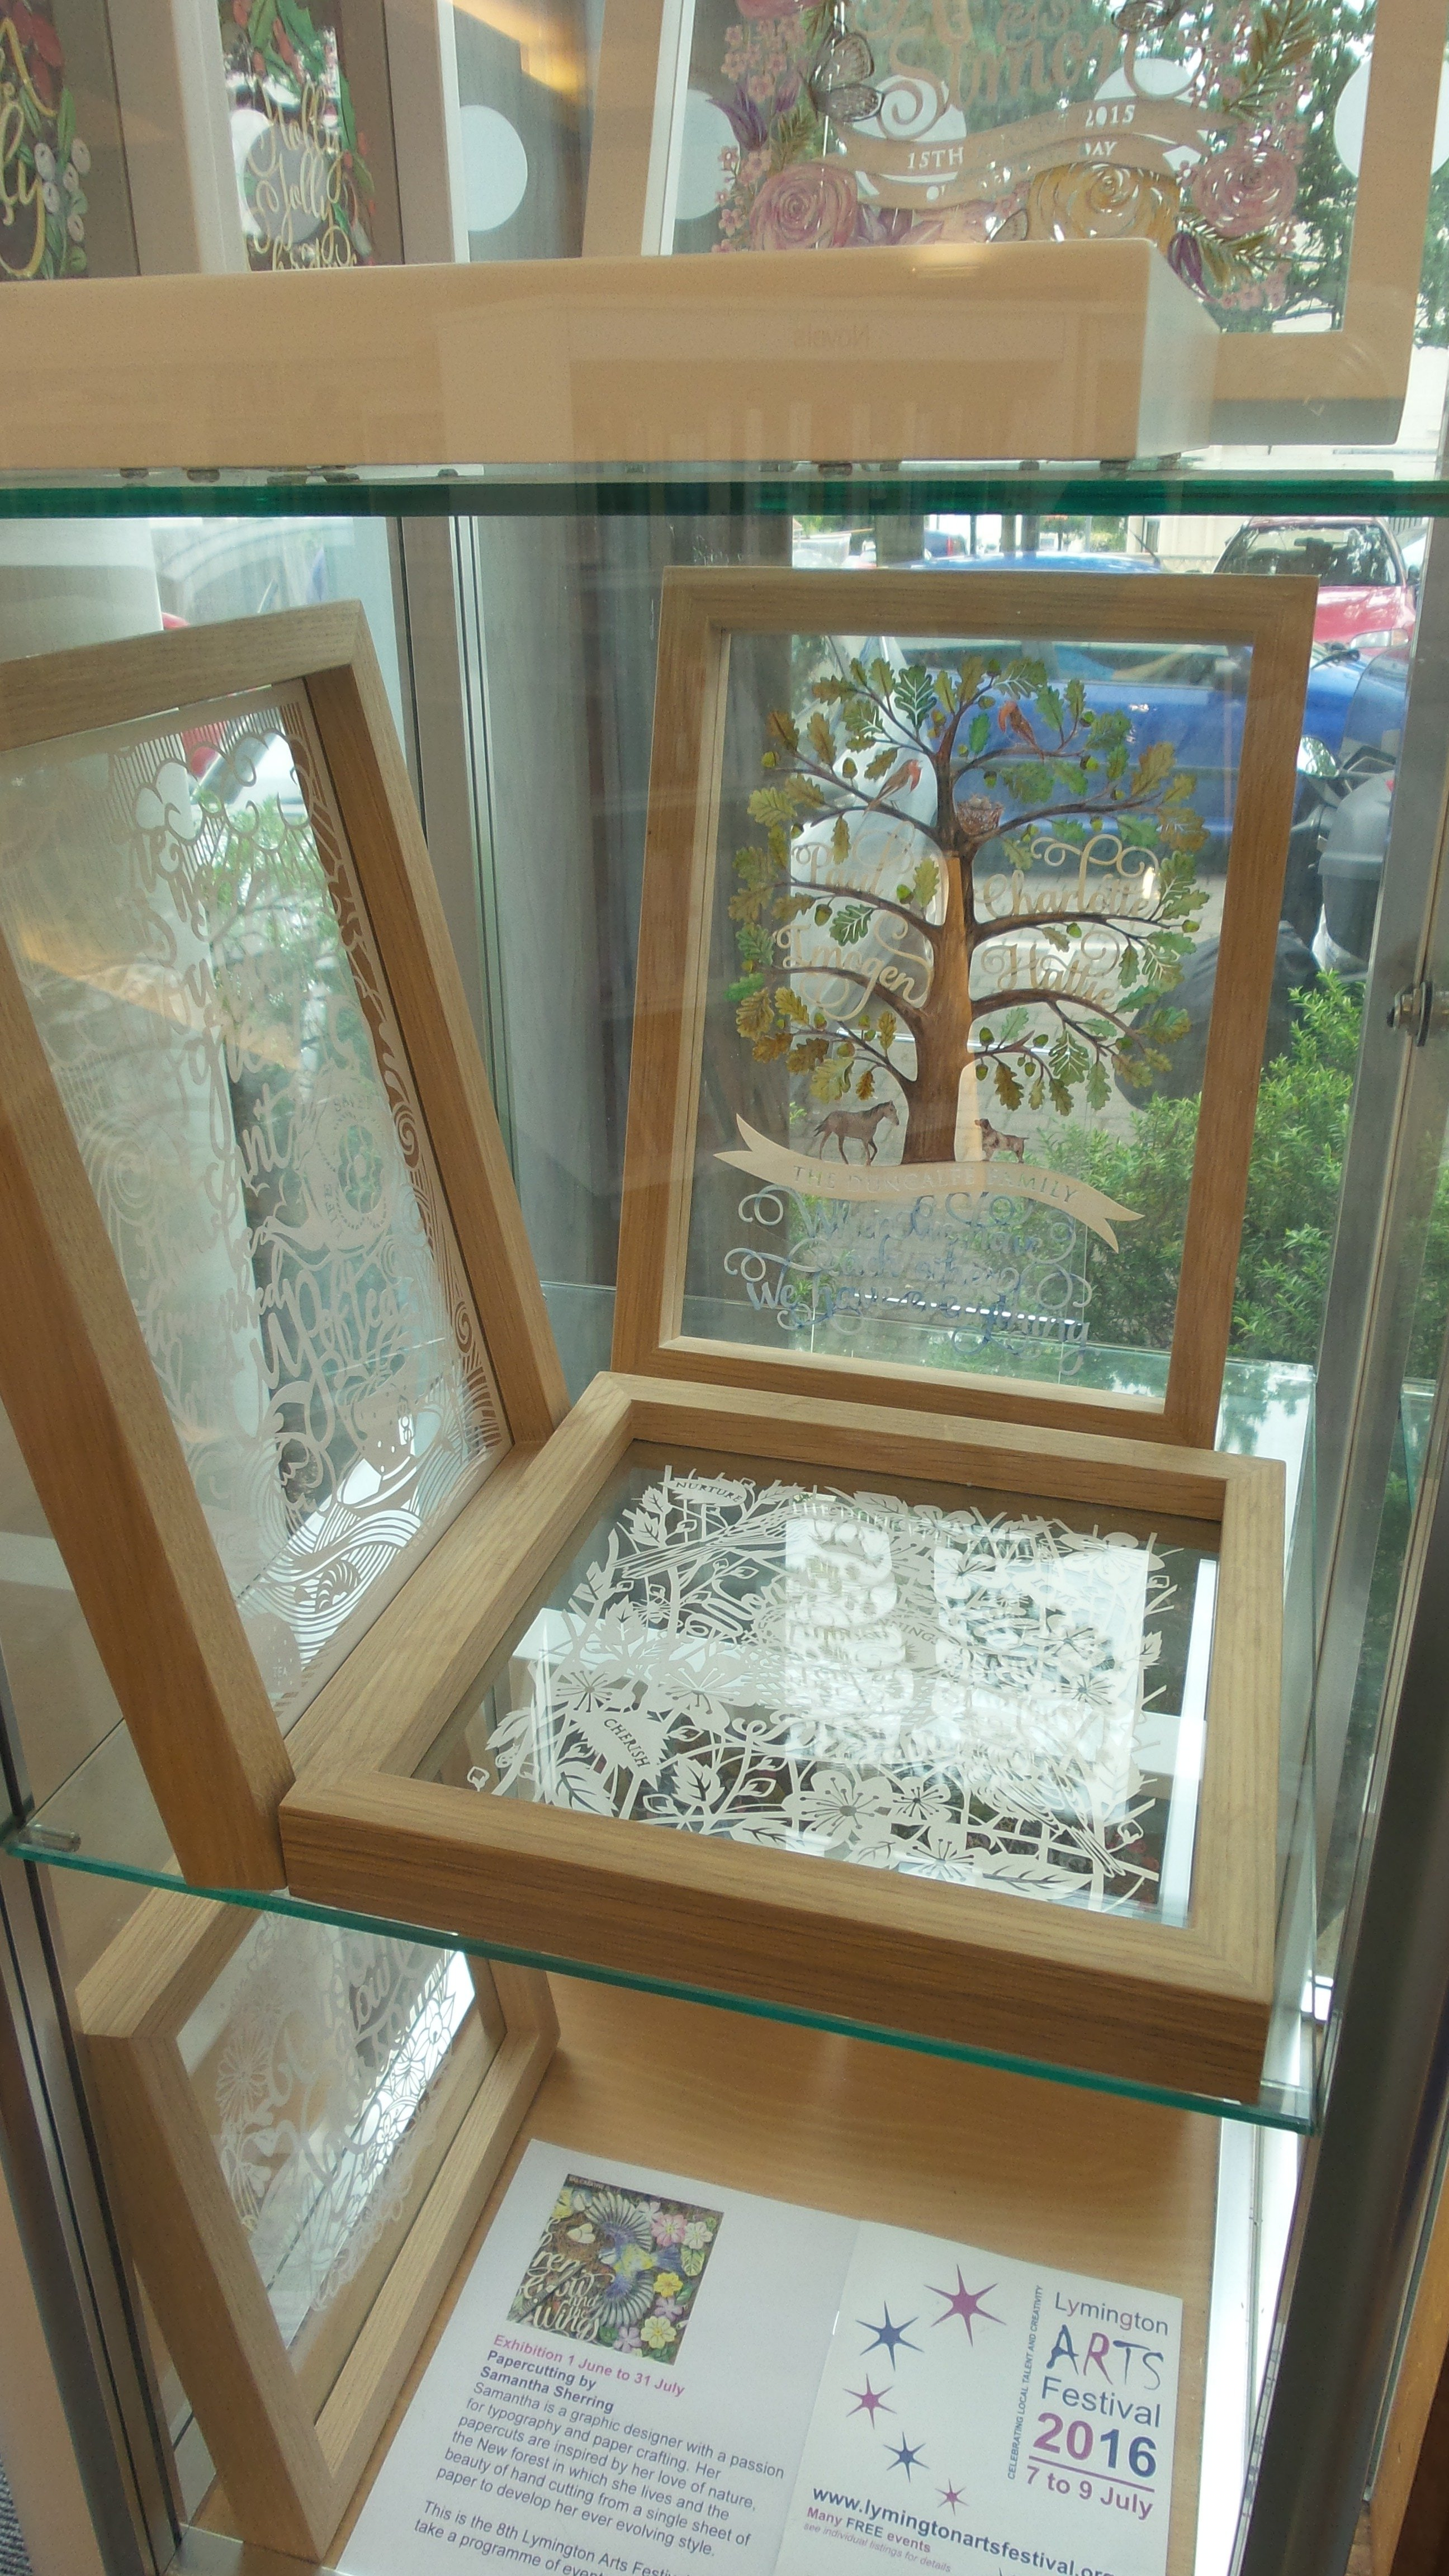 Samantha Sherring's papercrafts at Lymington Library